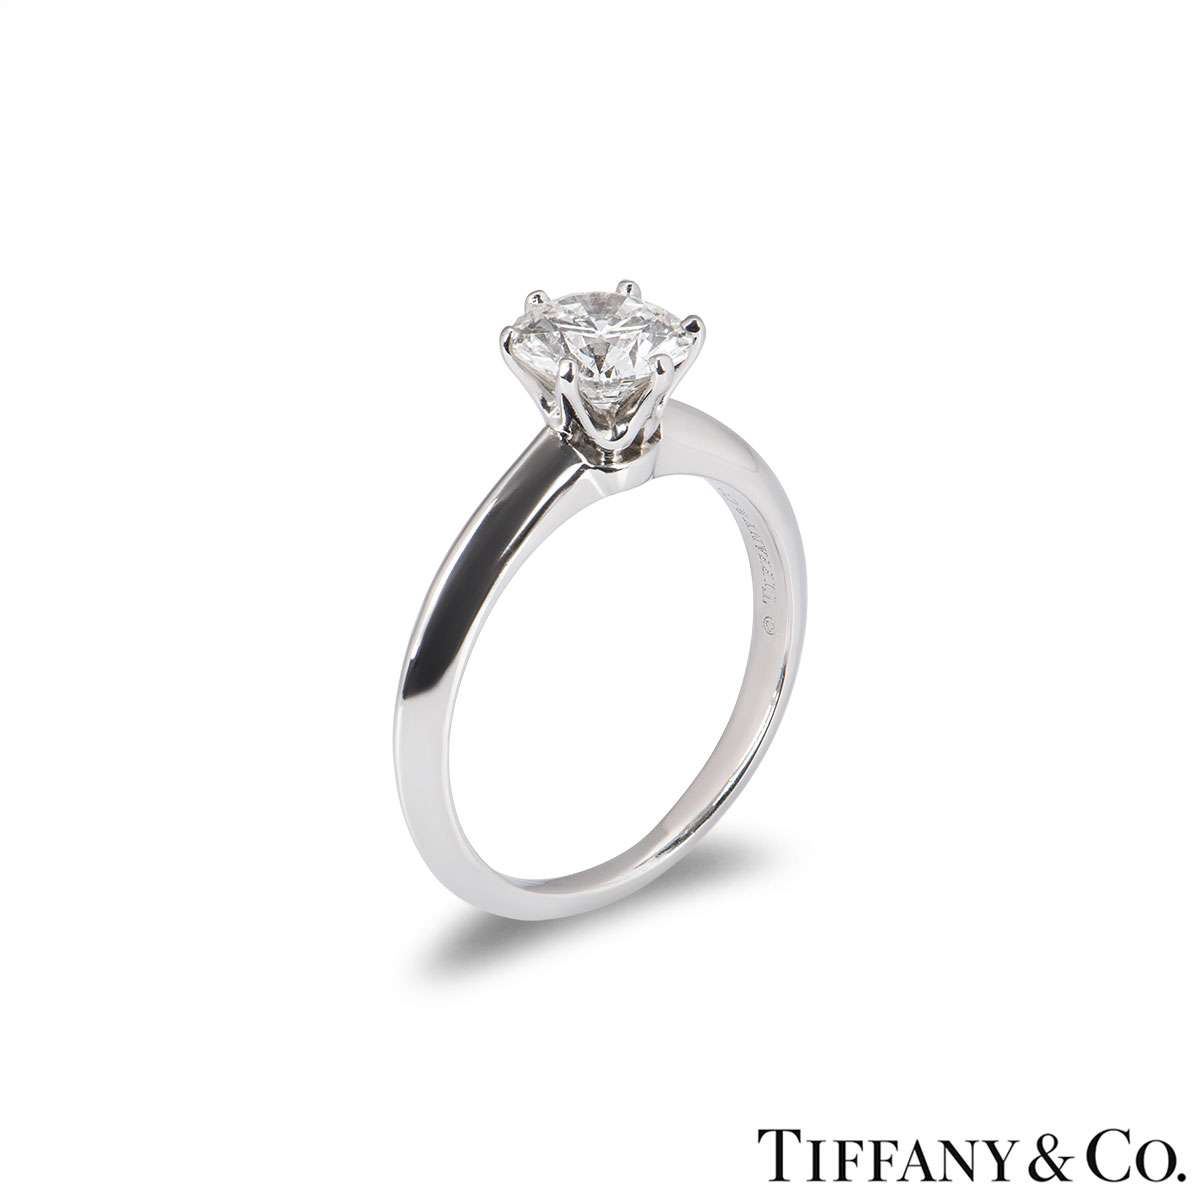 Tiffany & Co. Round Brilliant Cut Diamond Ring 0.99ct G/VS2 XXX